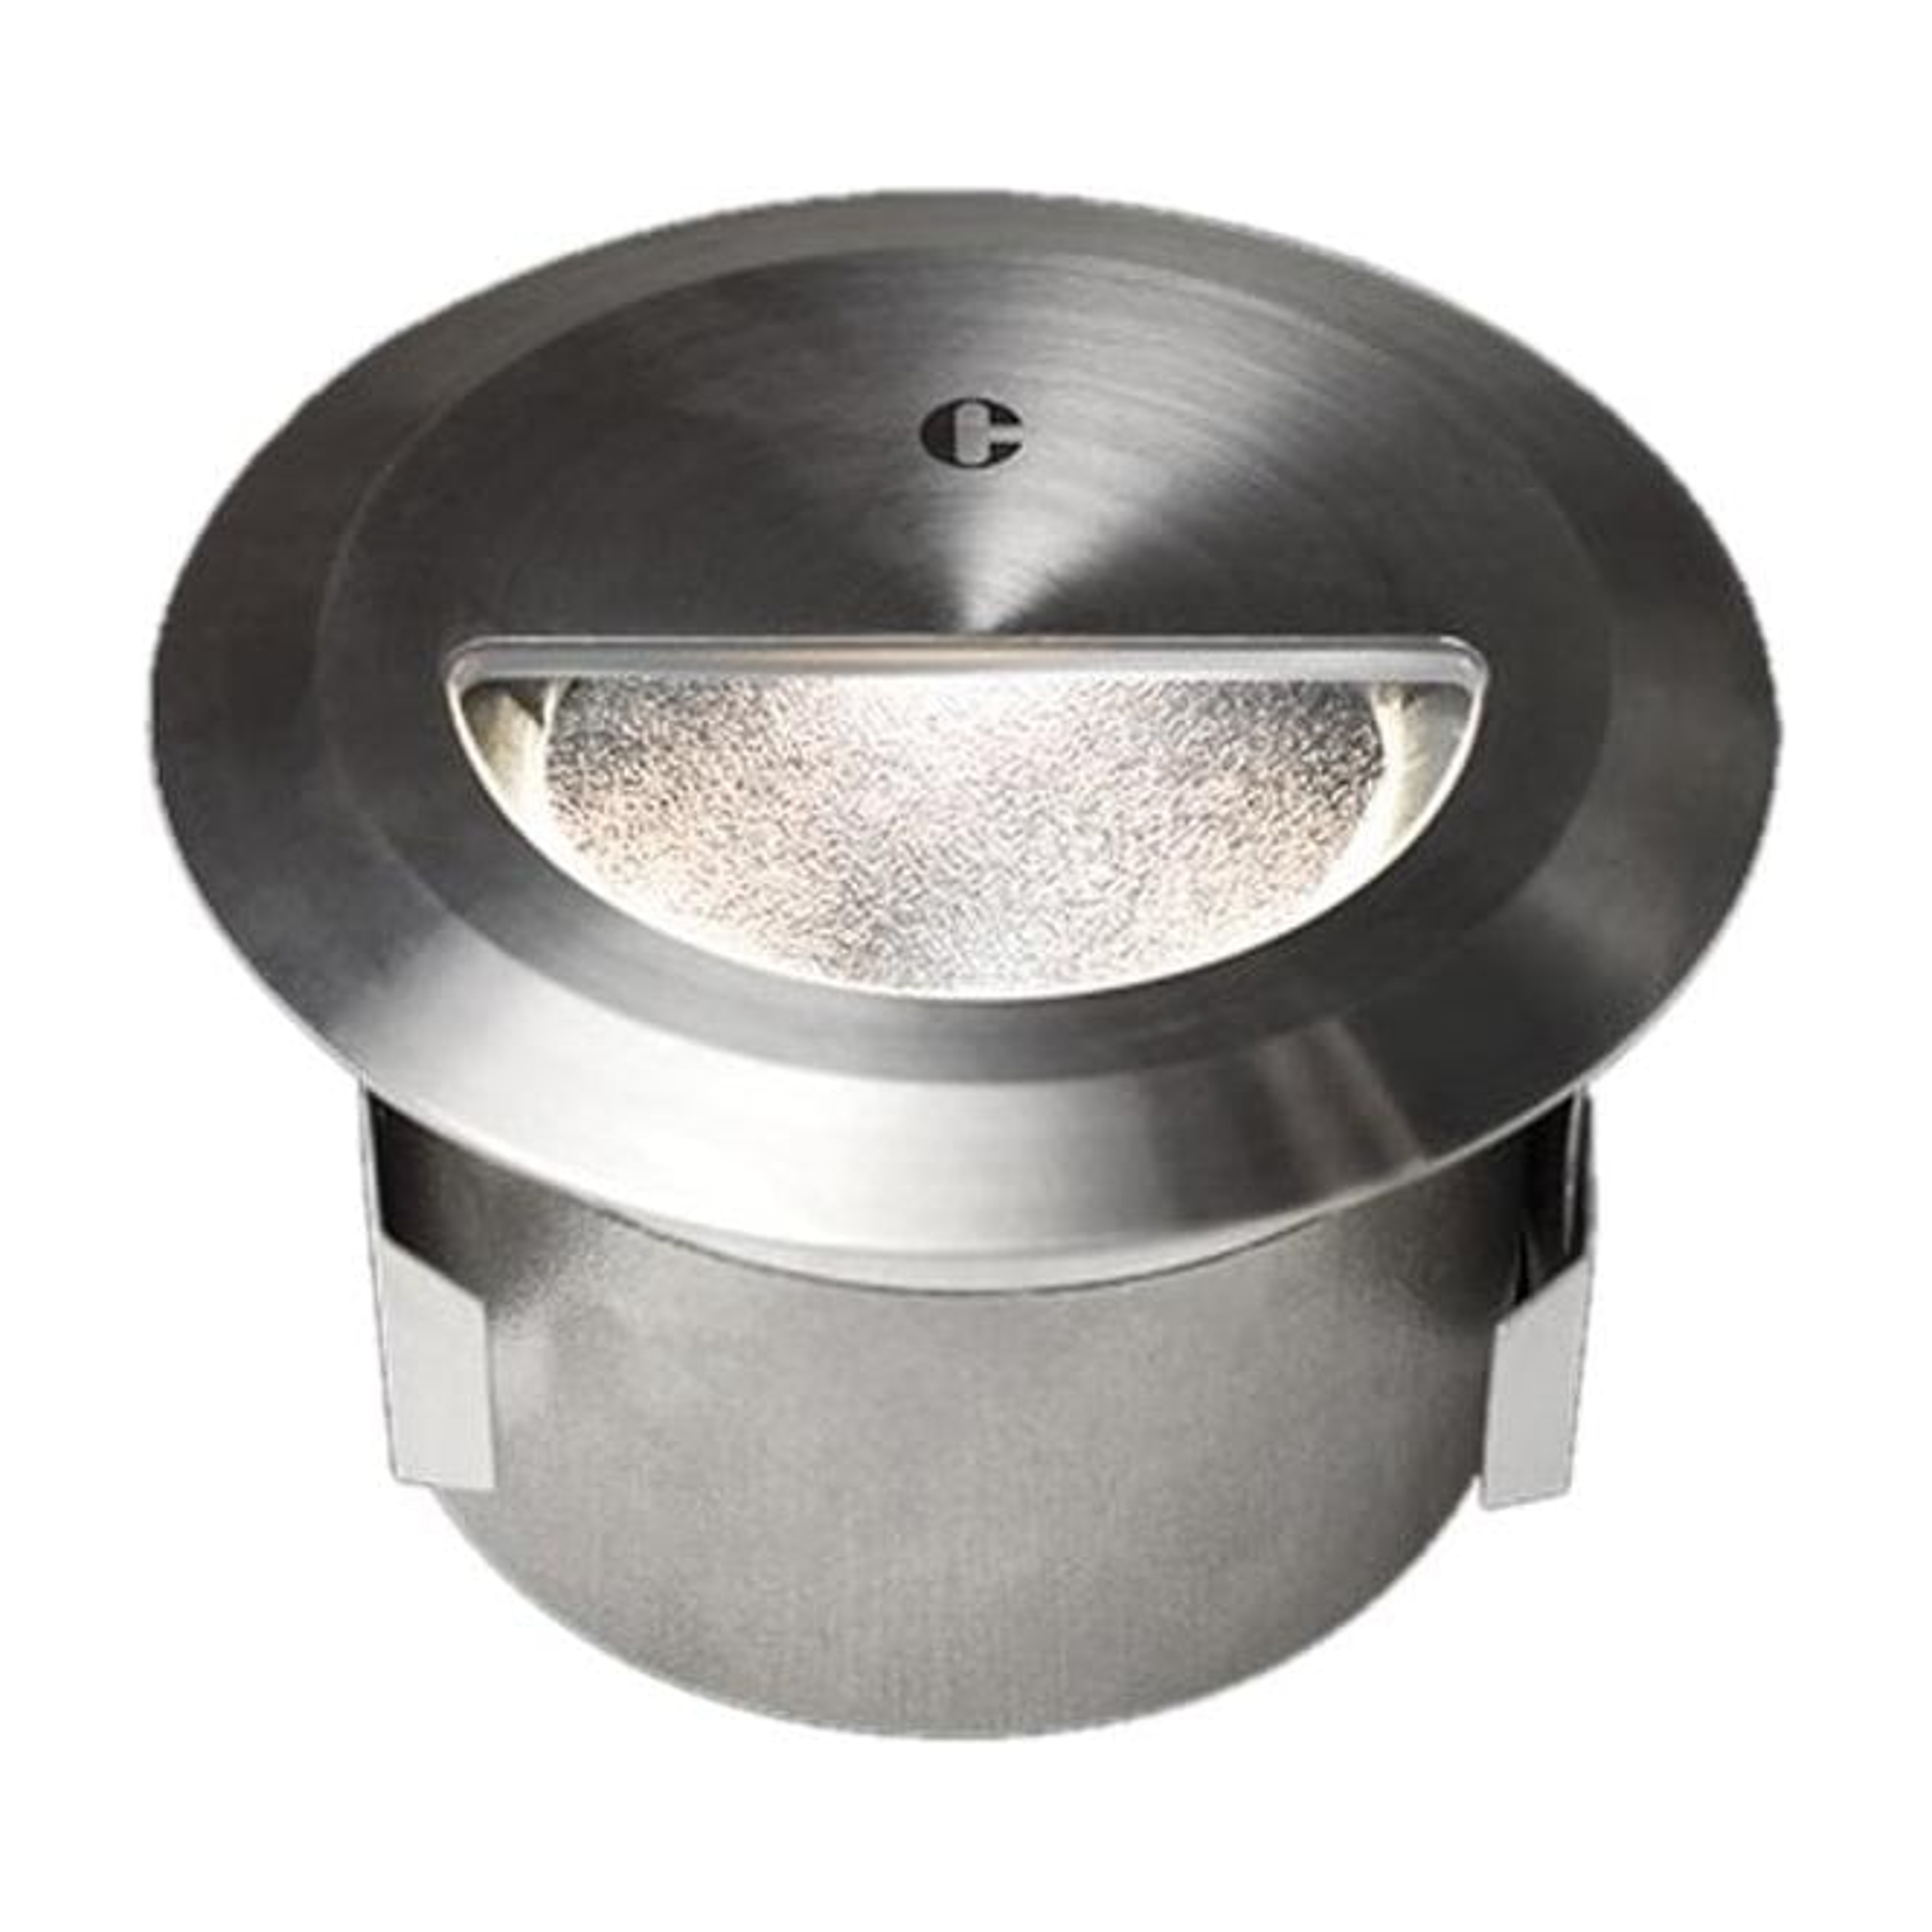 Collingwood Lighting WL340 Asymmetric mains brush finish step light - Stainless steel